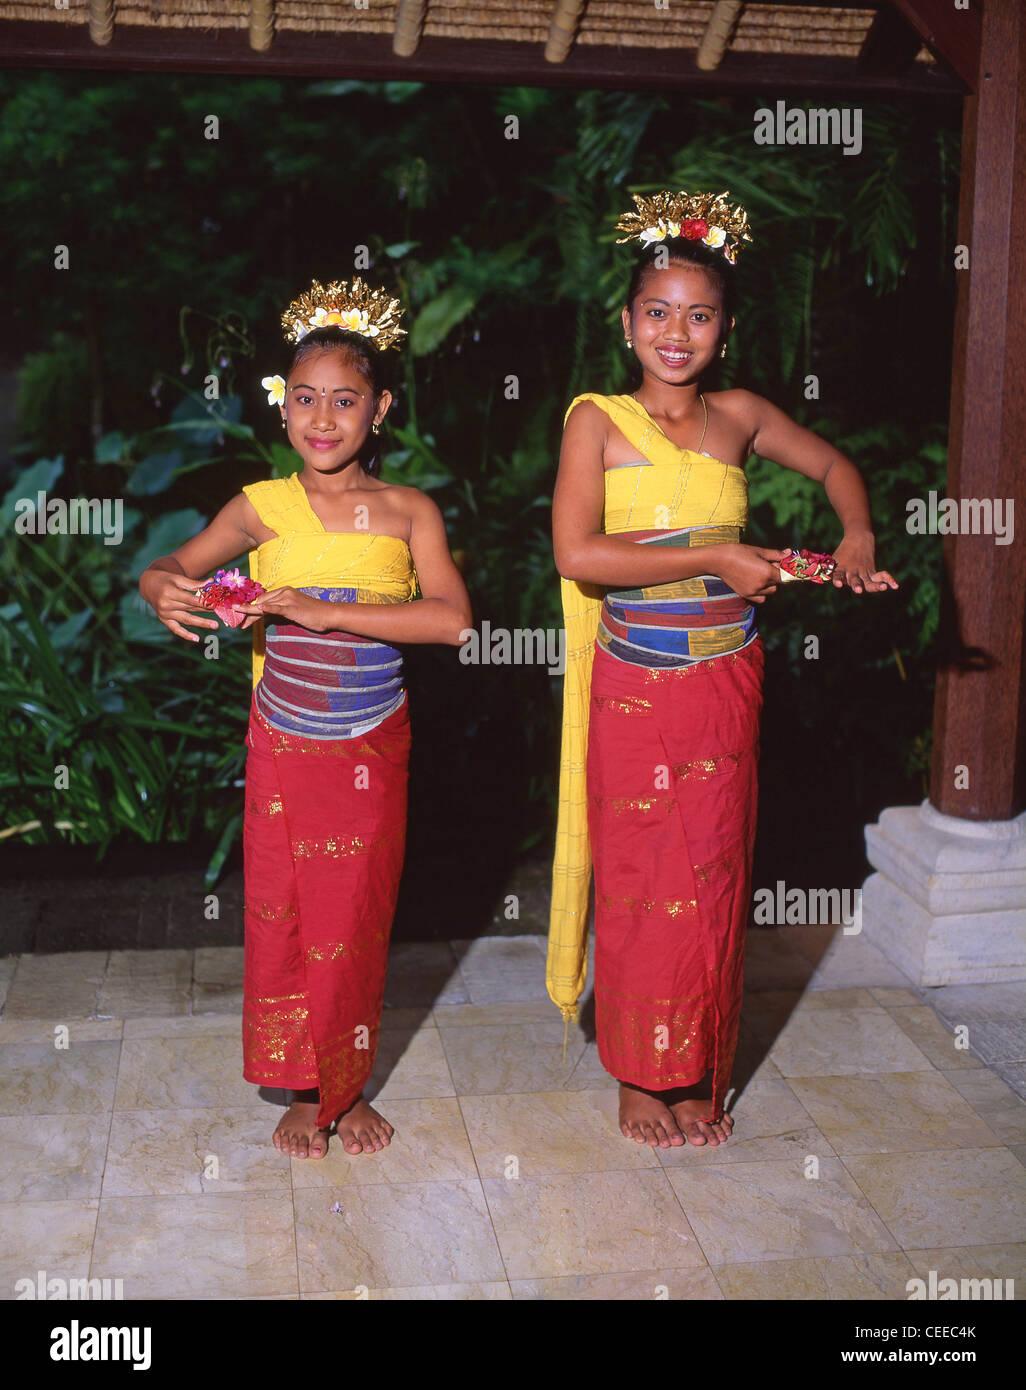 Young female Balinese dancers, Bali, Bali Province, Lesser Sunda Islands, Indonesia - Stock Image